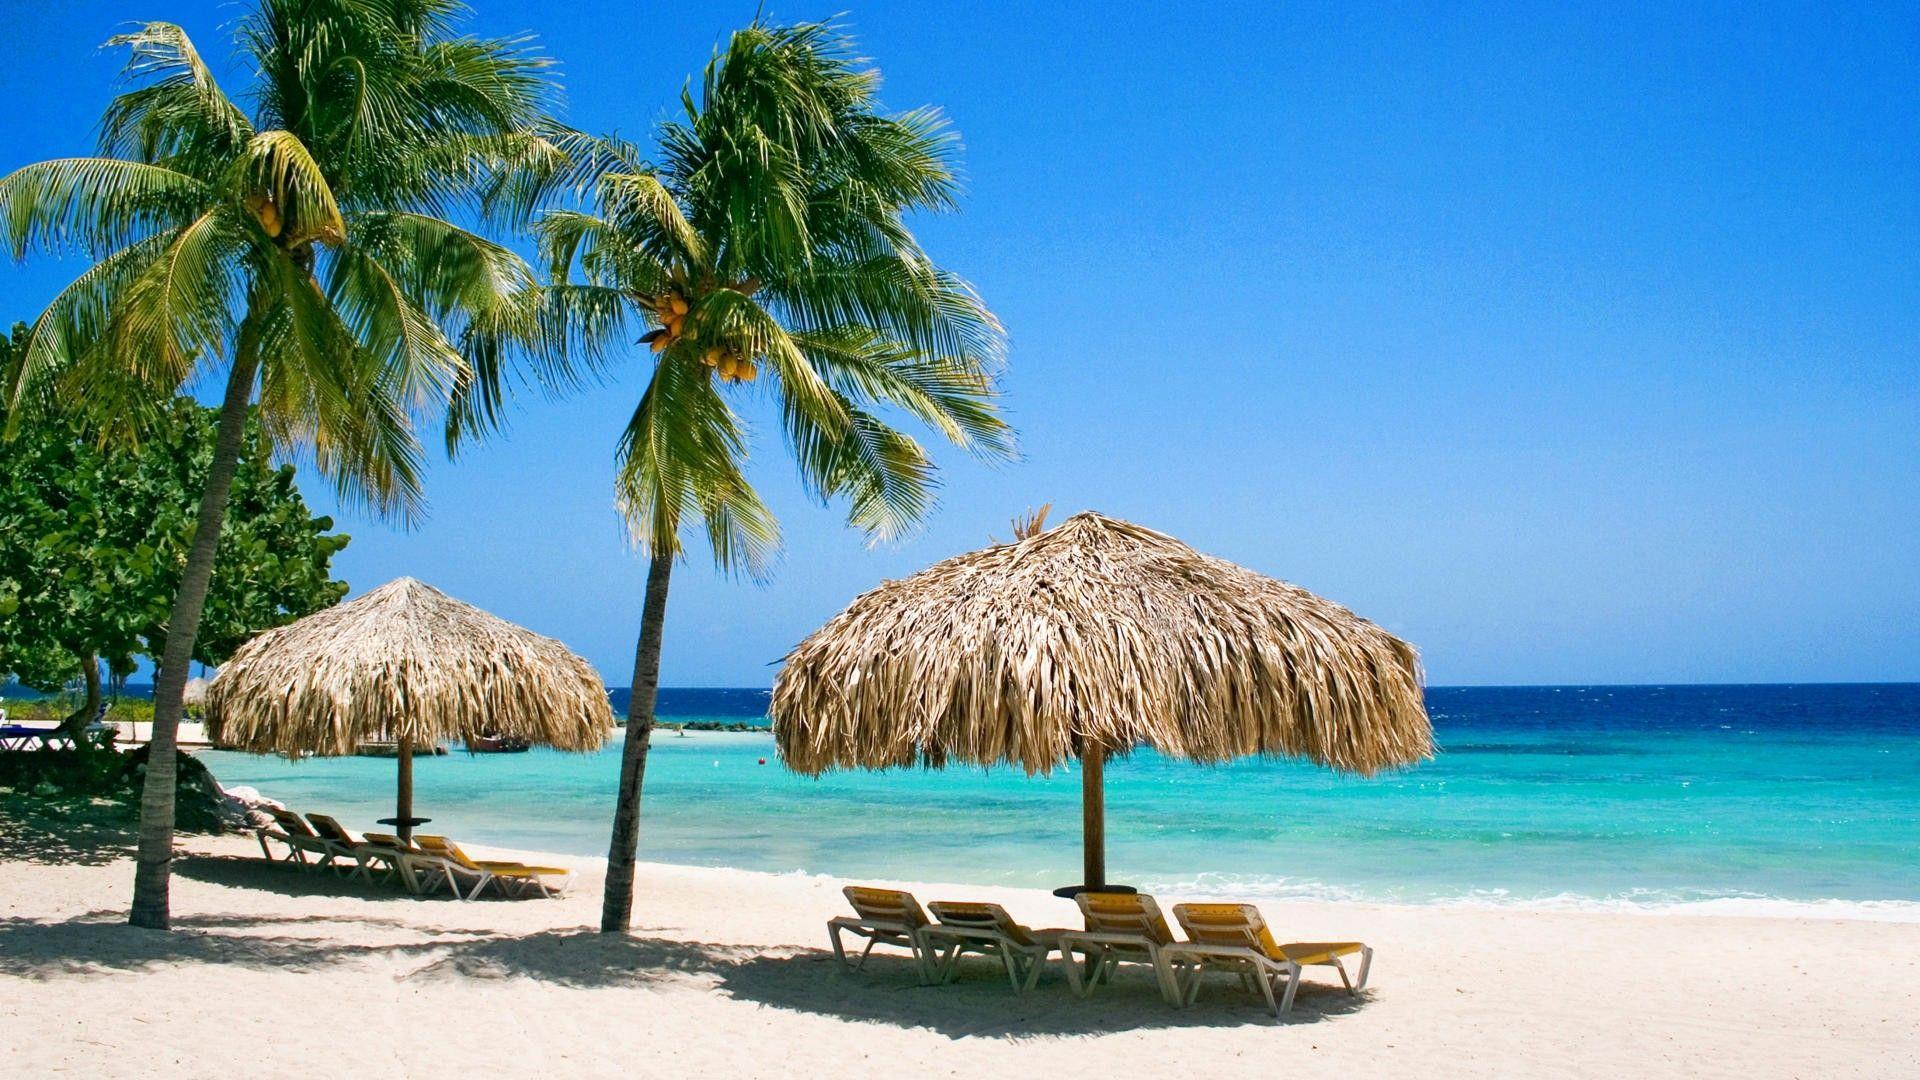 Free 65 Aruba Beachfront Scene Desktop Wallpapers